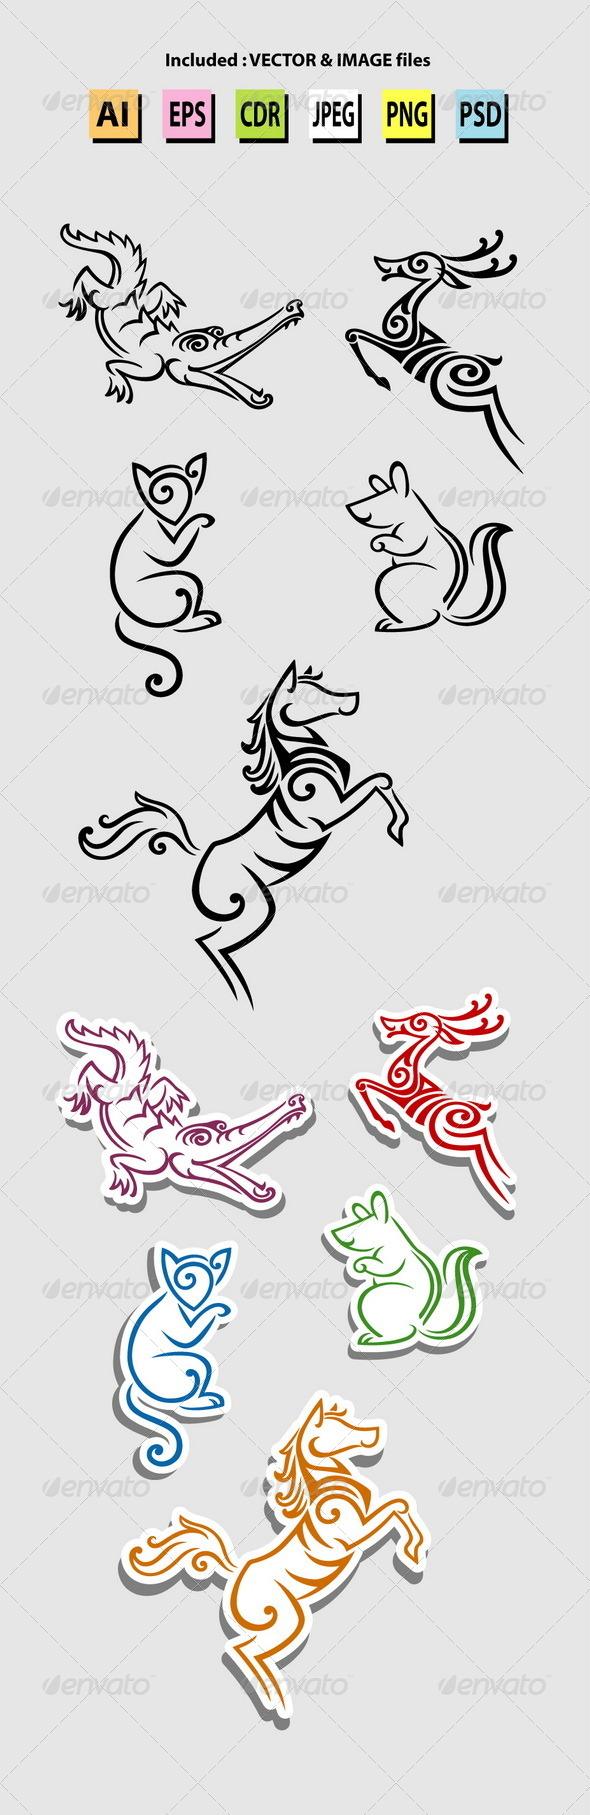 GraphicRiver Animal Symbols 6573567